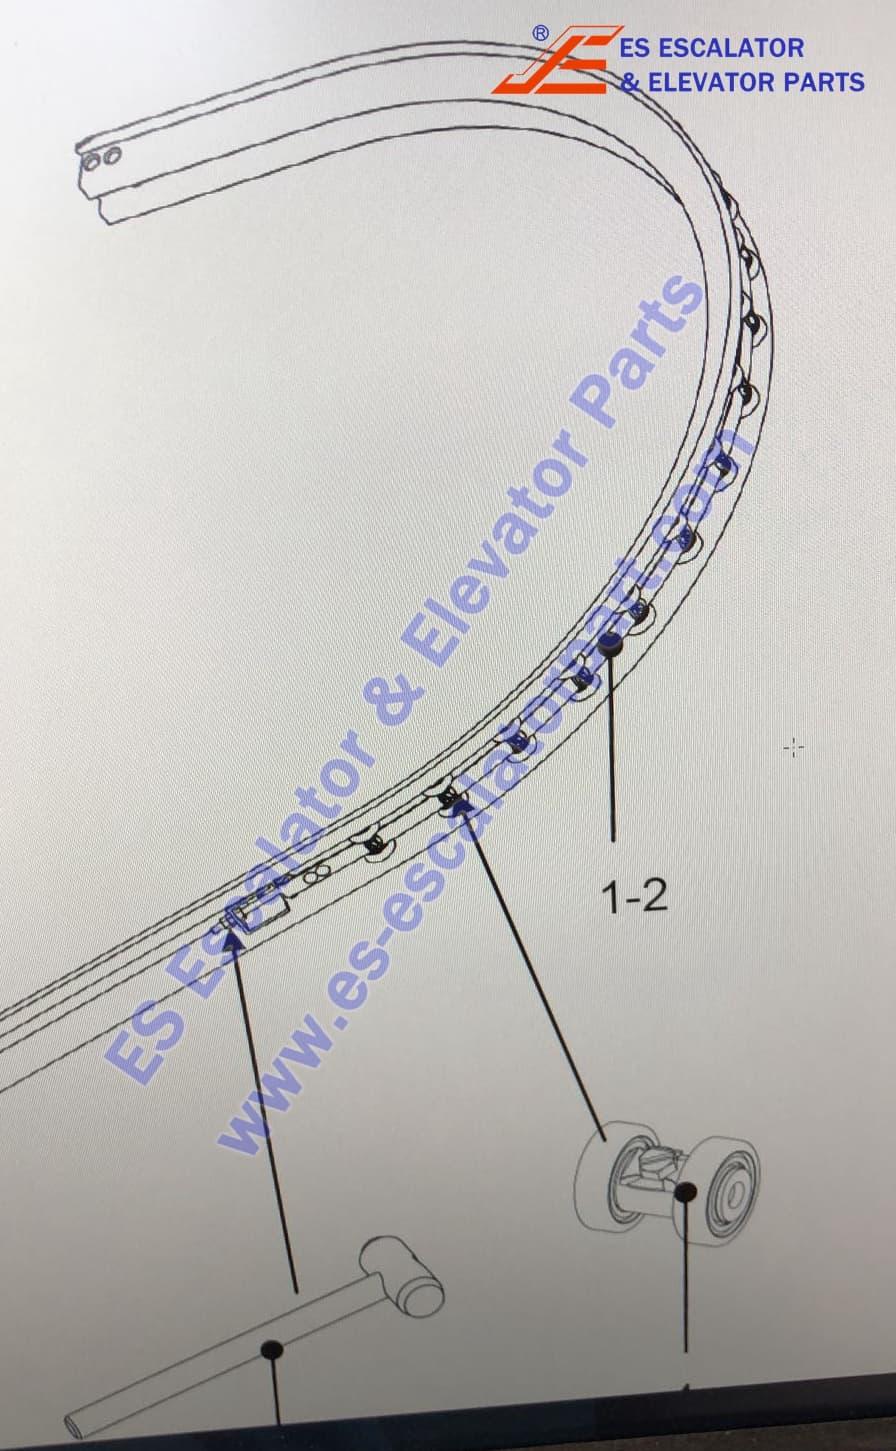 OTis Escalator DAA332AB51 Newell roller chain